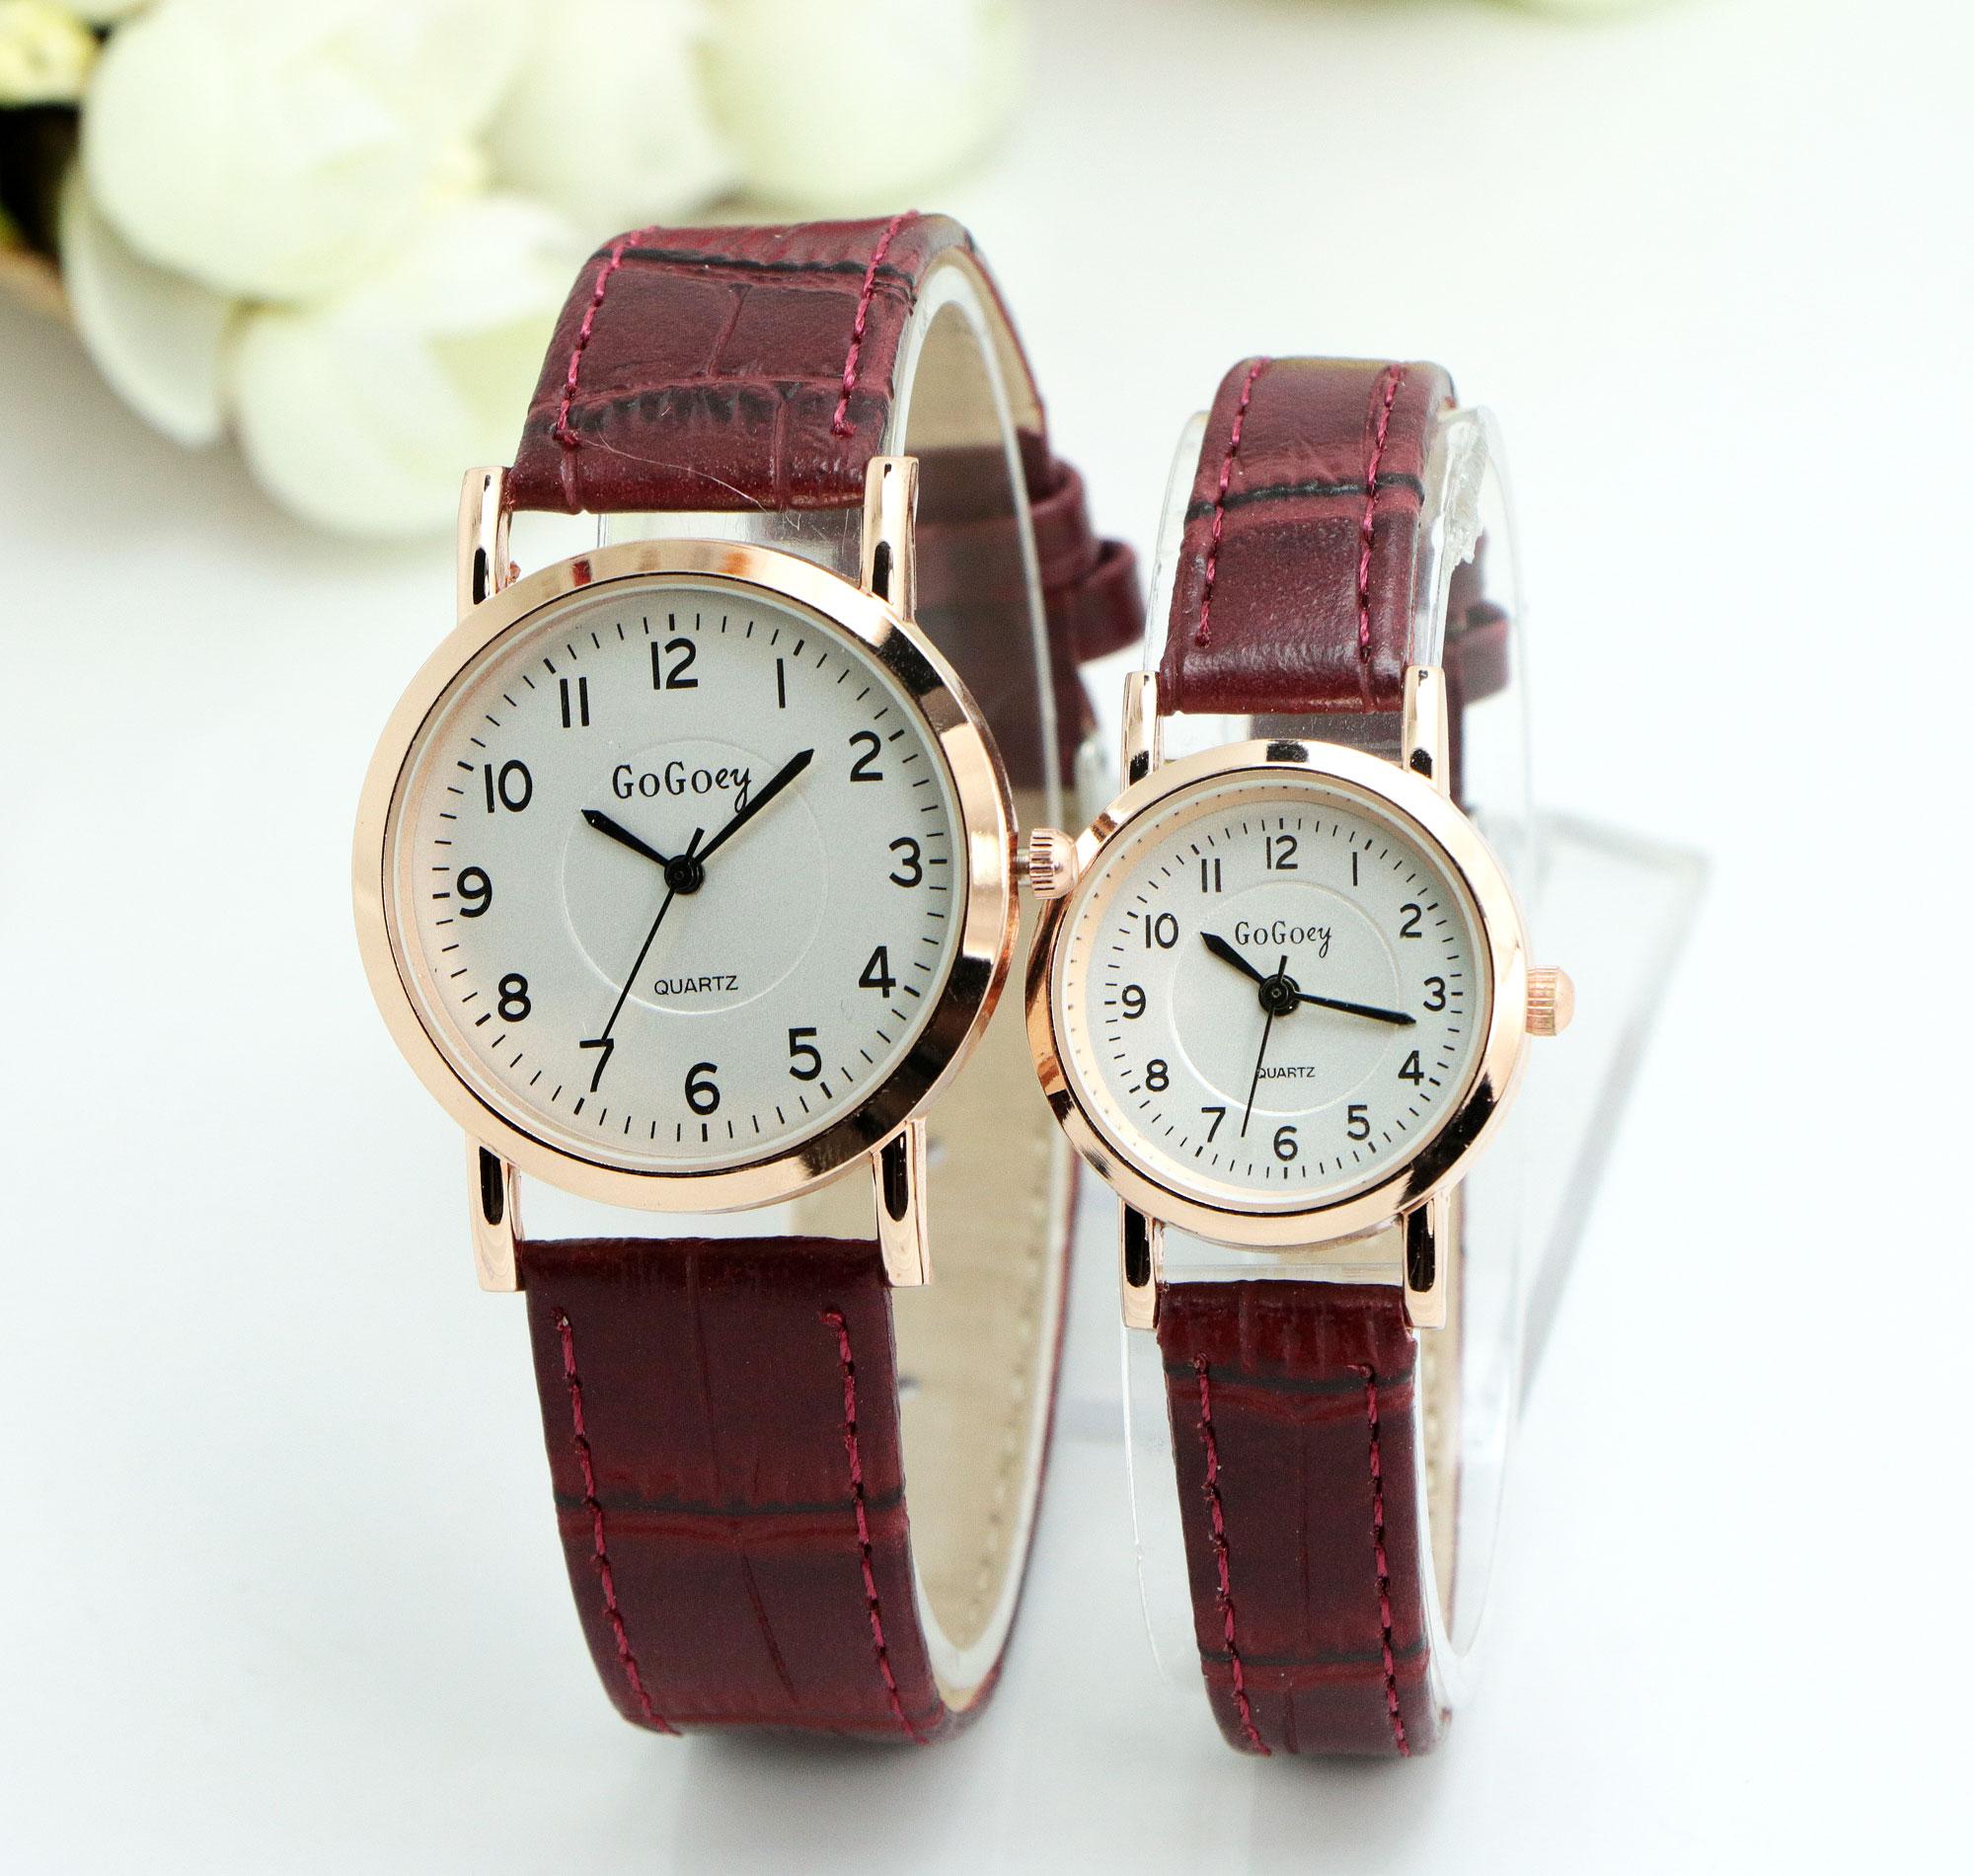 Hot Sales Gogoey Brand Leather Pair Watches Women Men Lovers Couple Fashion Dress Quartz Wristwatch G844